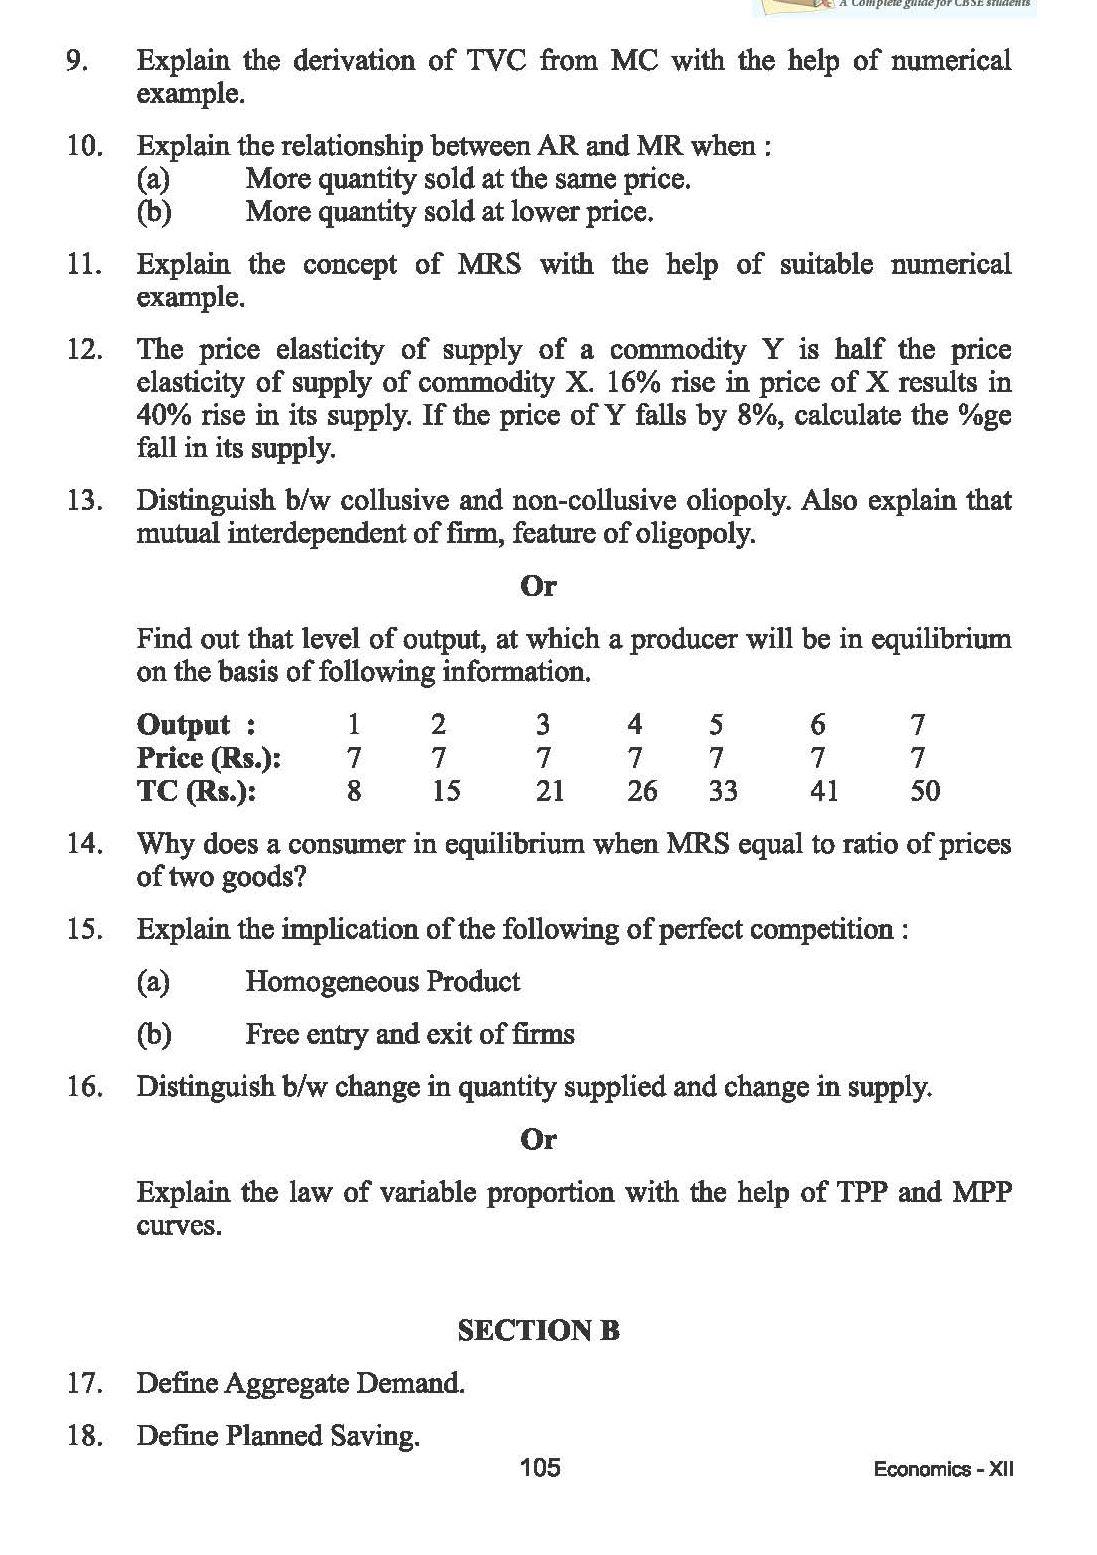 Help with Economics paper?